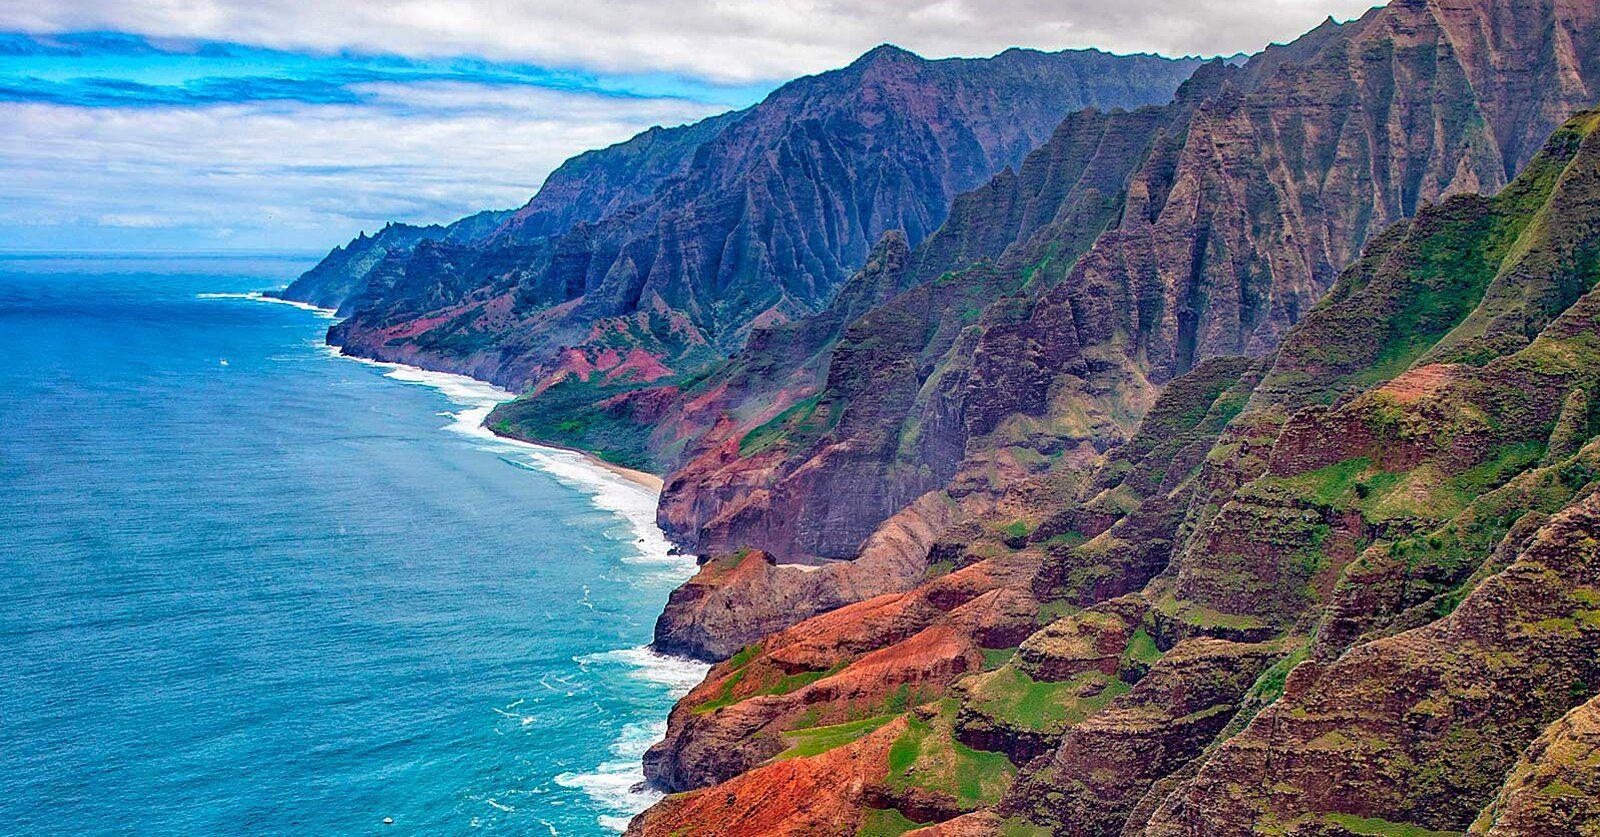 Kauai Hawaii Guide: Kauai Is a Paradise on Earth — Here's What to Do When You're There | Travel + Leisure